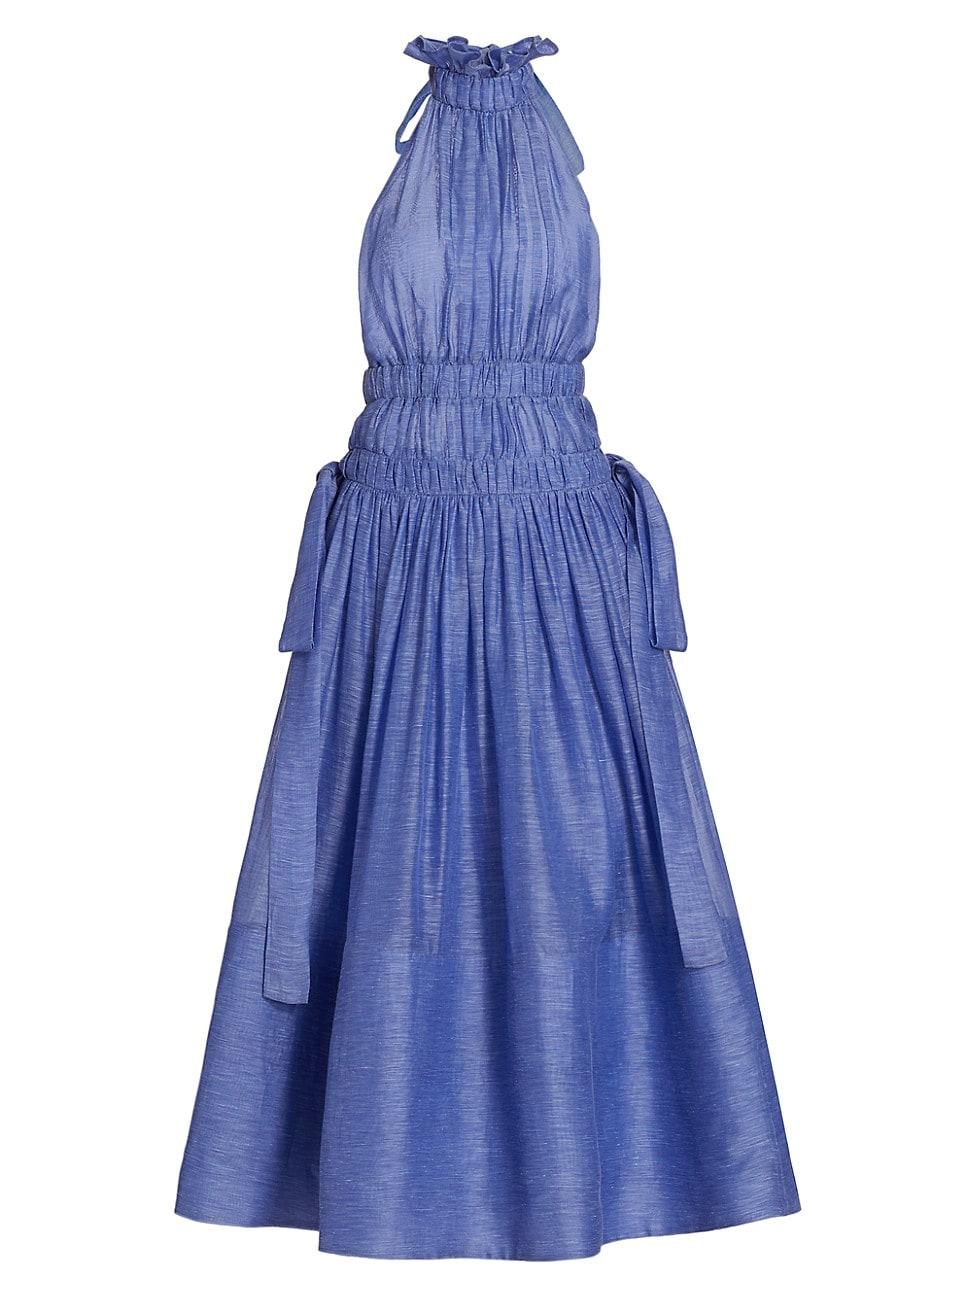 Zimmermann Gowns WOMEN'S WILD BOTANICA LUMINOUS RUFFLE HALTER GOWN